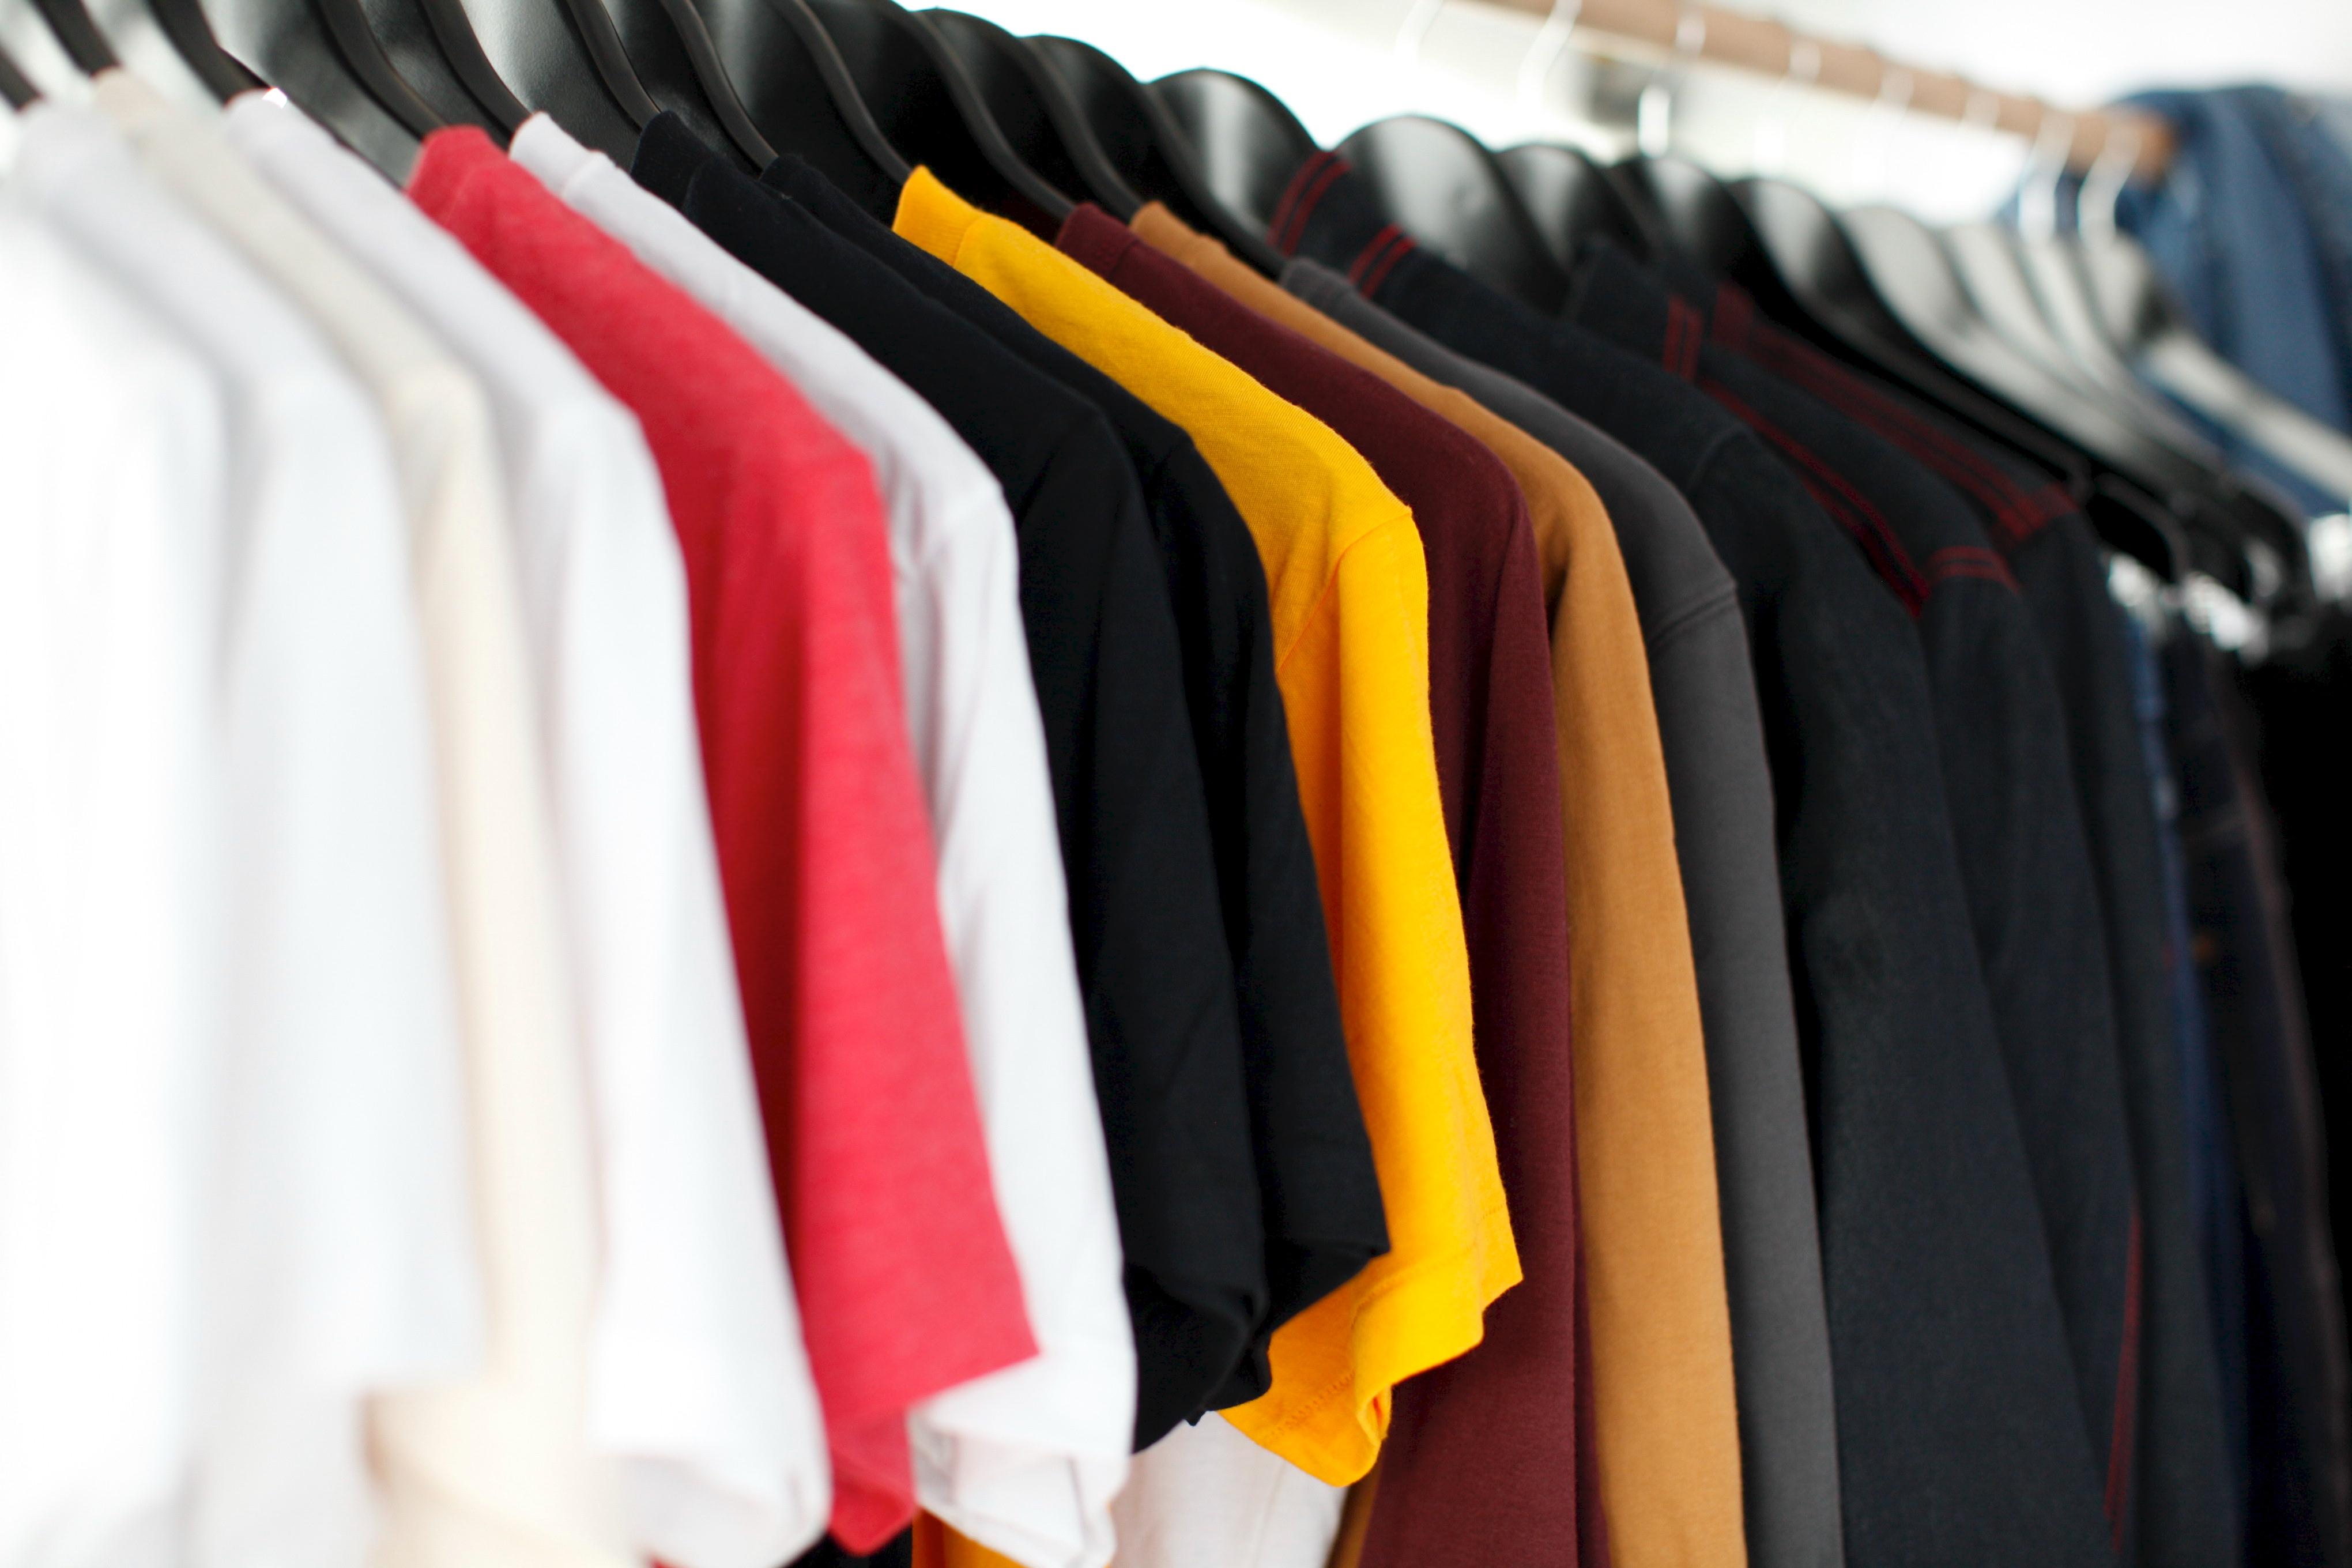 Farbe Kleidung Zimmer Hemd Marke Tee Verkauf T Shirt